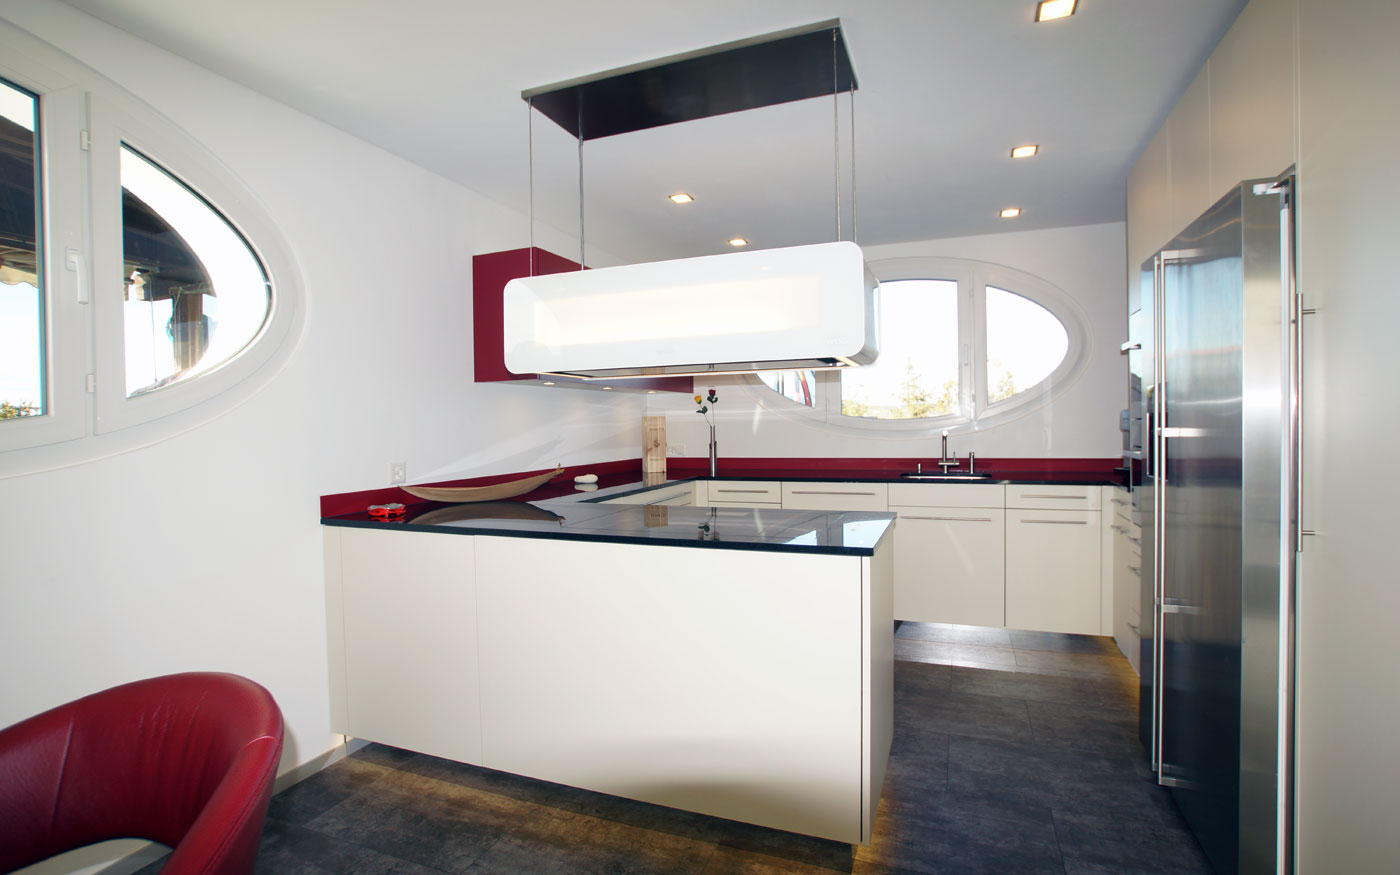 k che kreis k chen. Black Bedroom Furniture Sets. Home Design Ideas